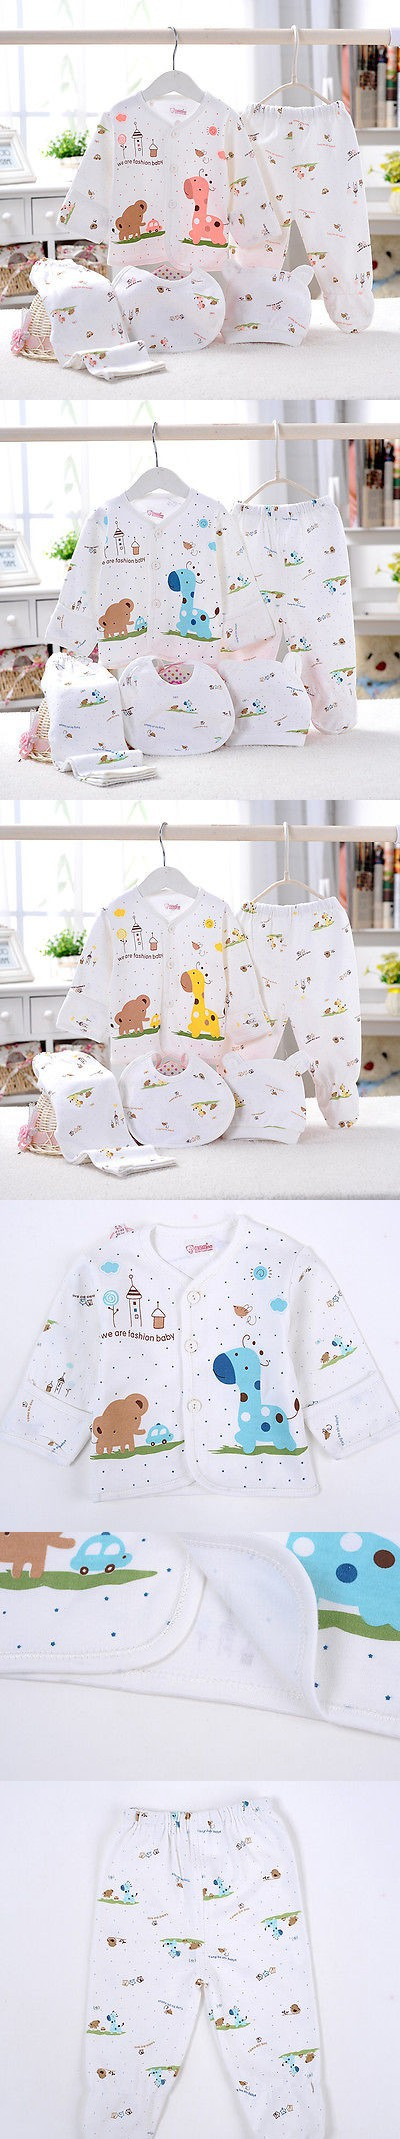 5pcs Set Newborn Baby Clothing 0 3 Month Boy Girls Cotton Cartoon